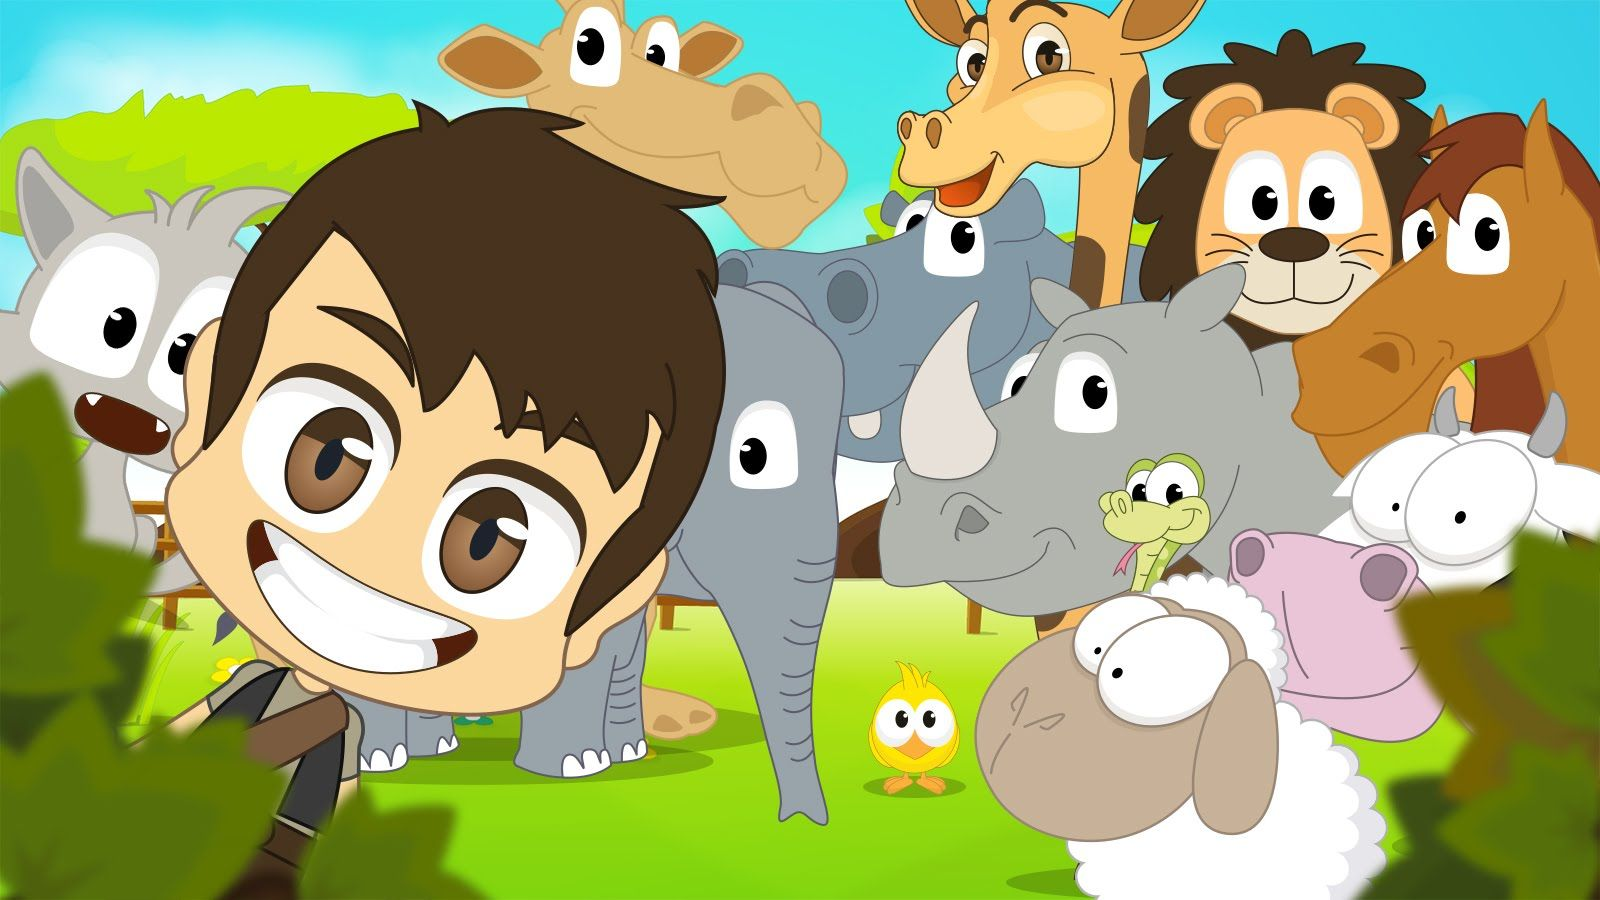 Animals For Kids In Arabic اسماء الحيوانات للأطفال باللغة العربية Animals For Kids Kids Learning Arabic